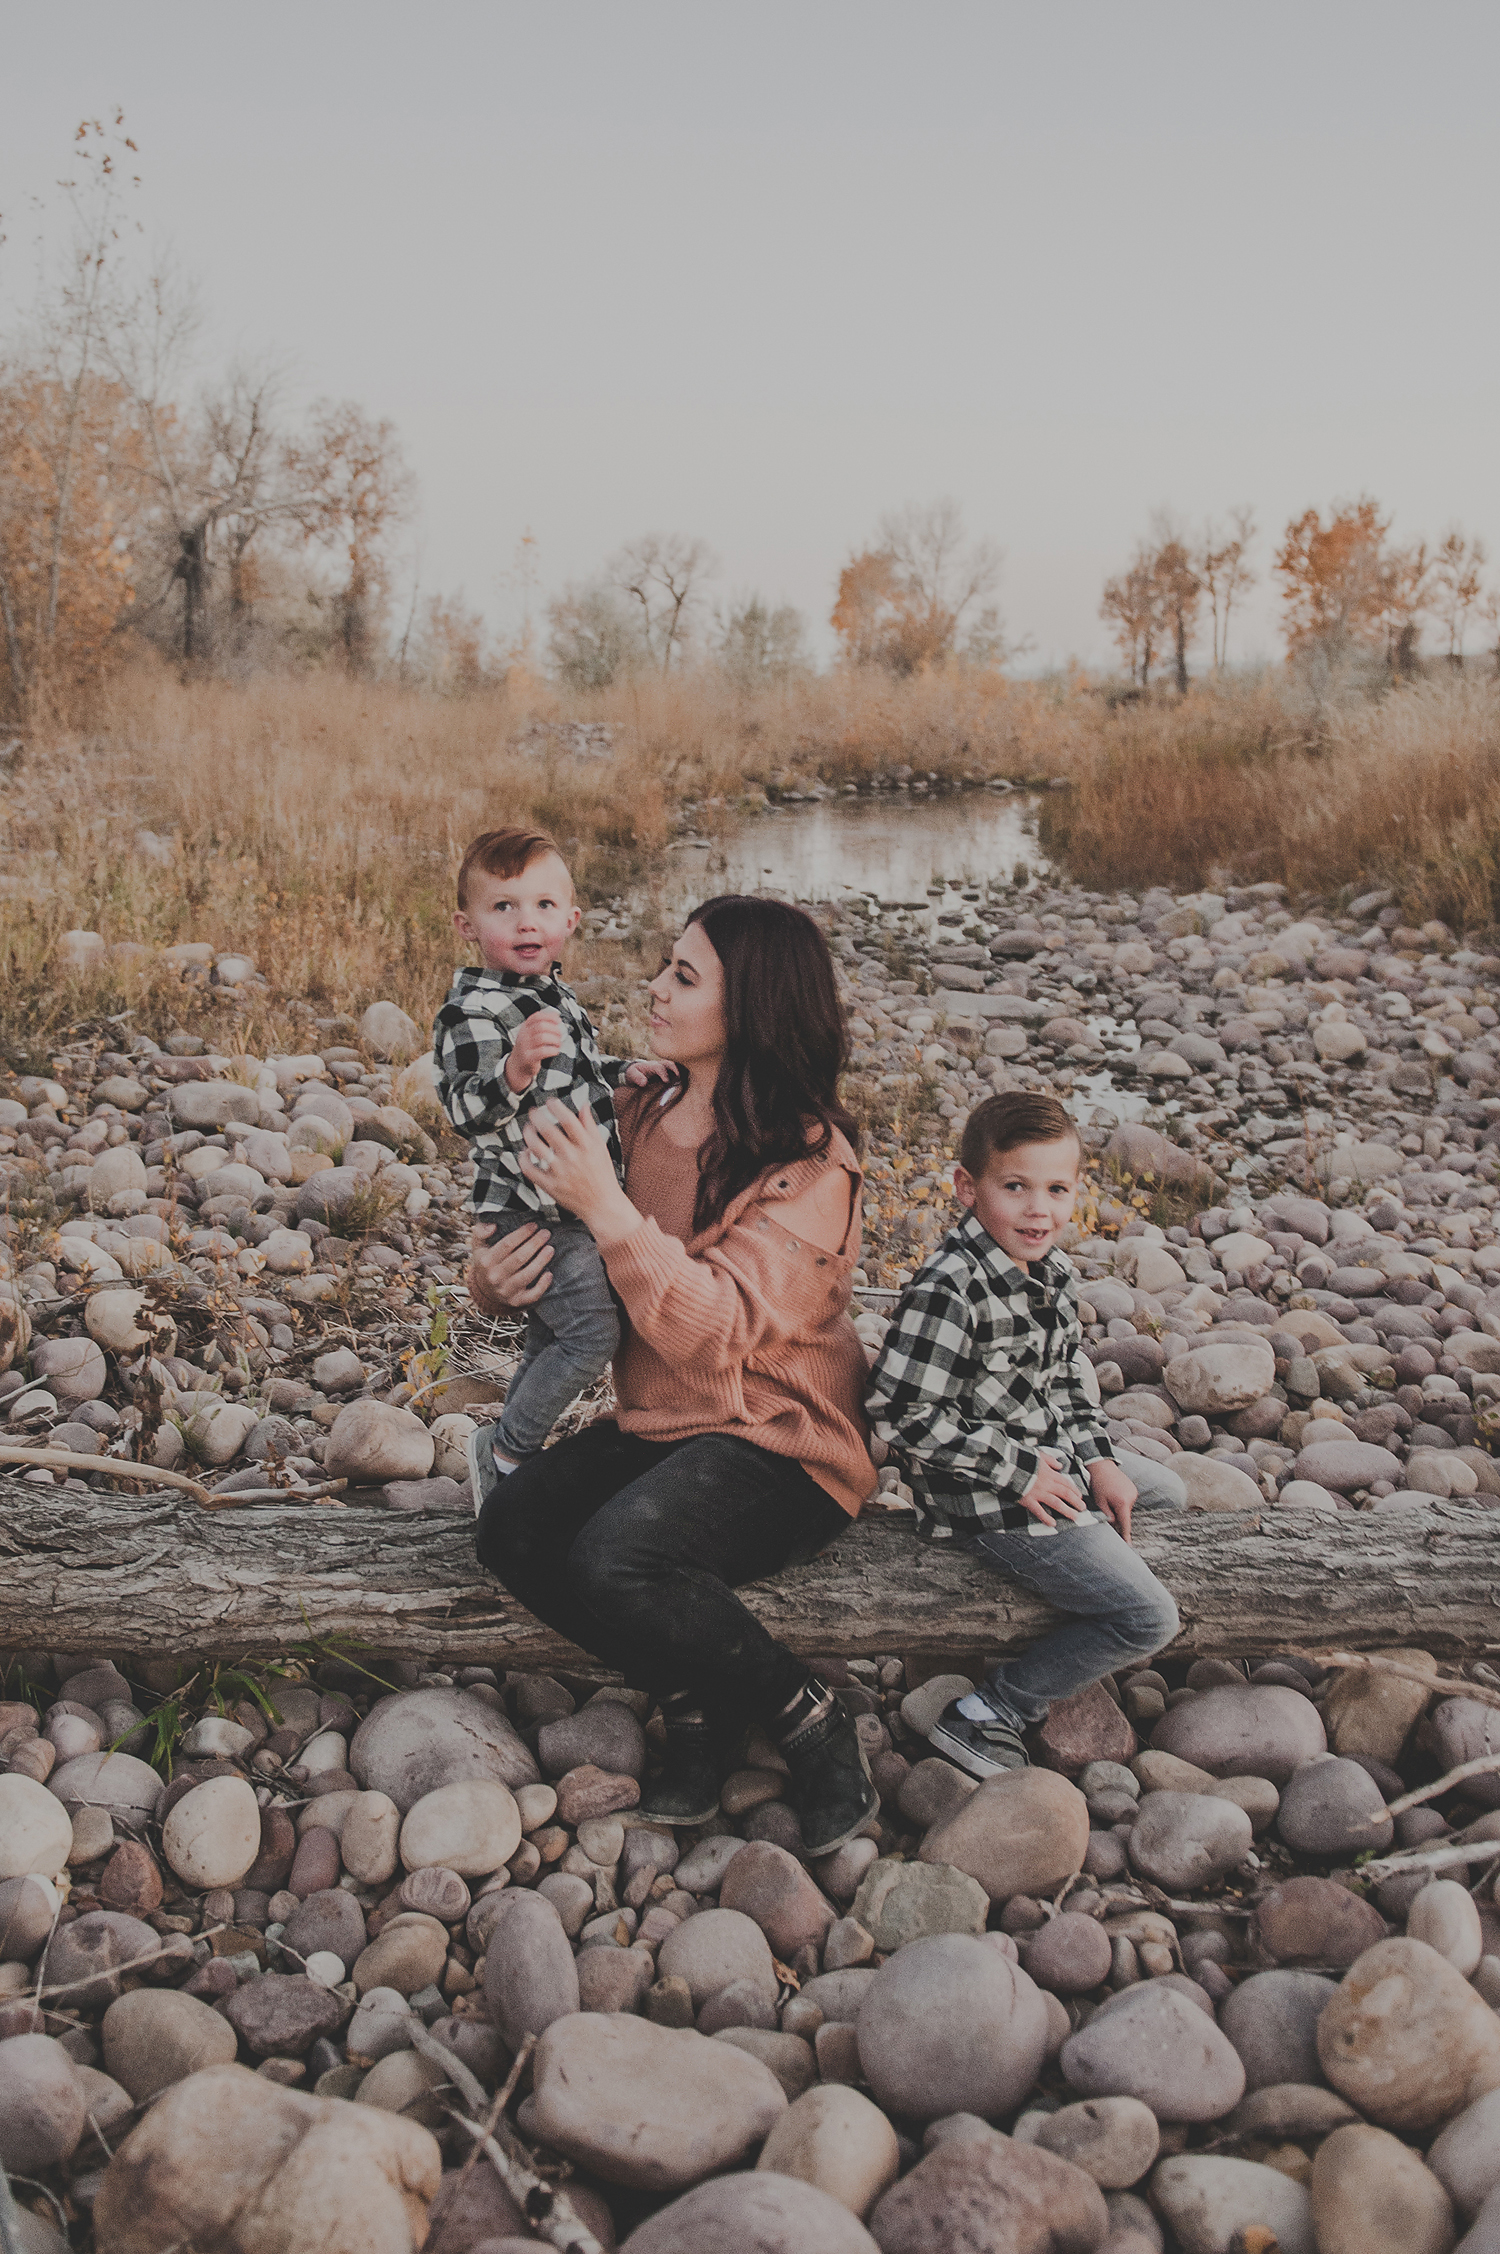 Mom sitting on log with kids